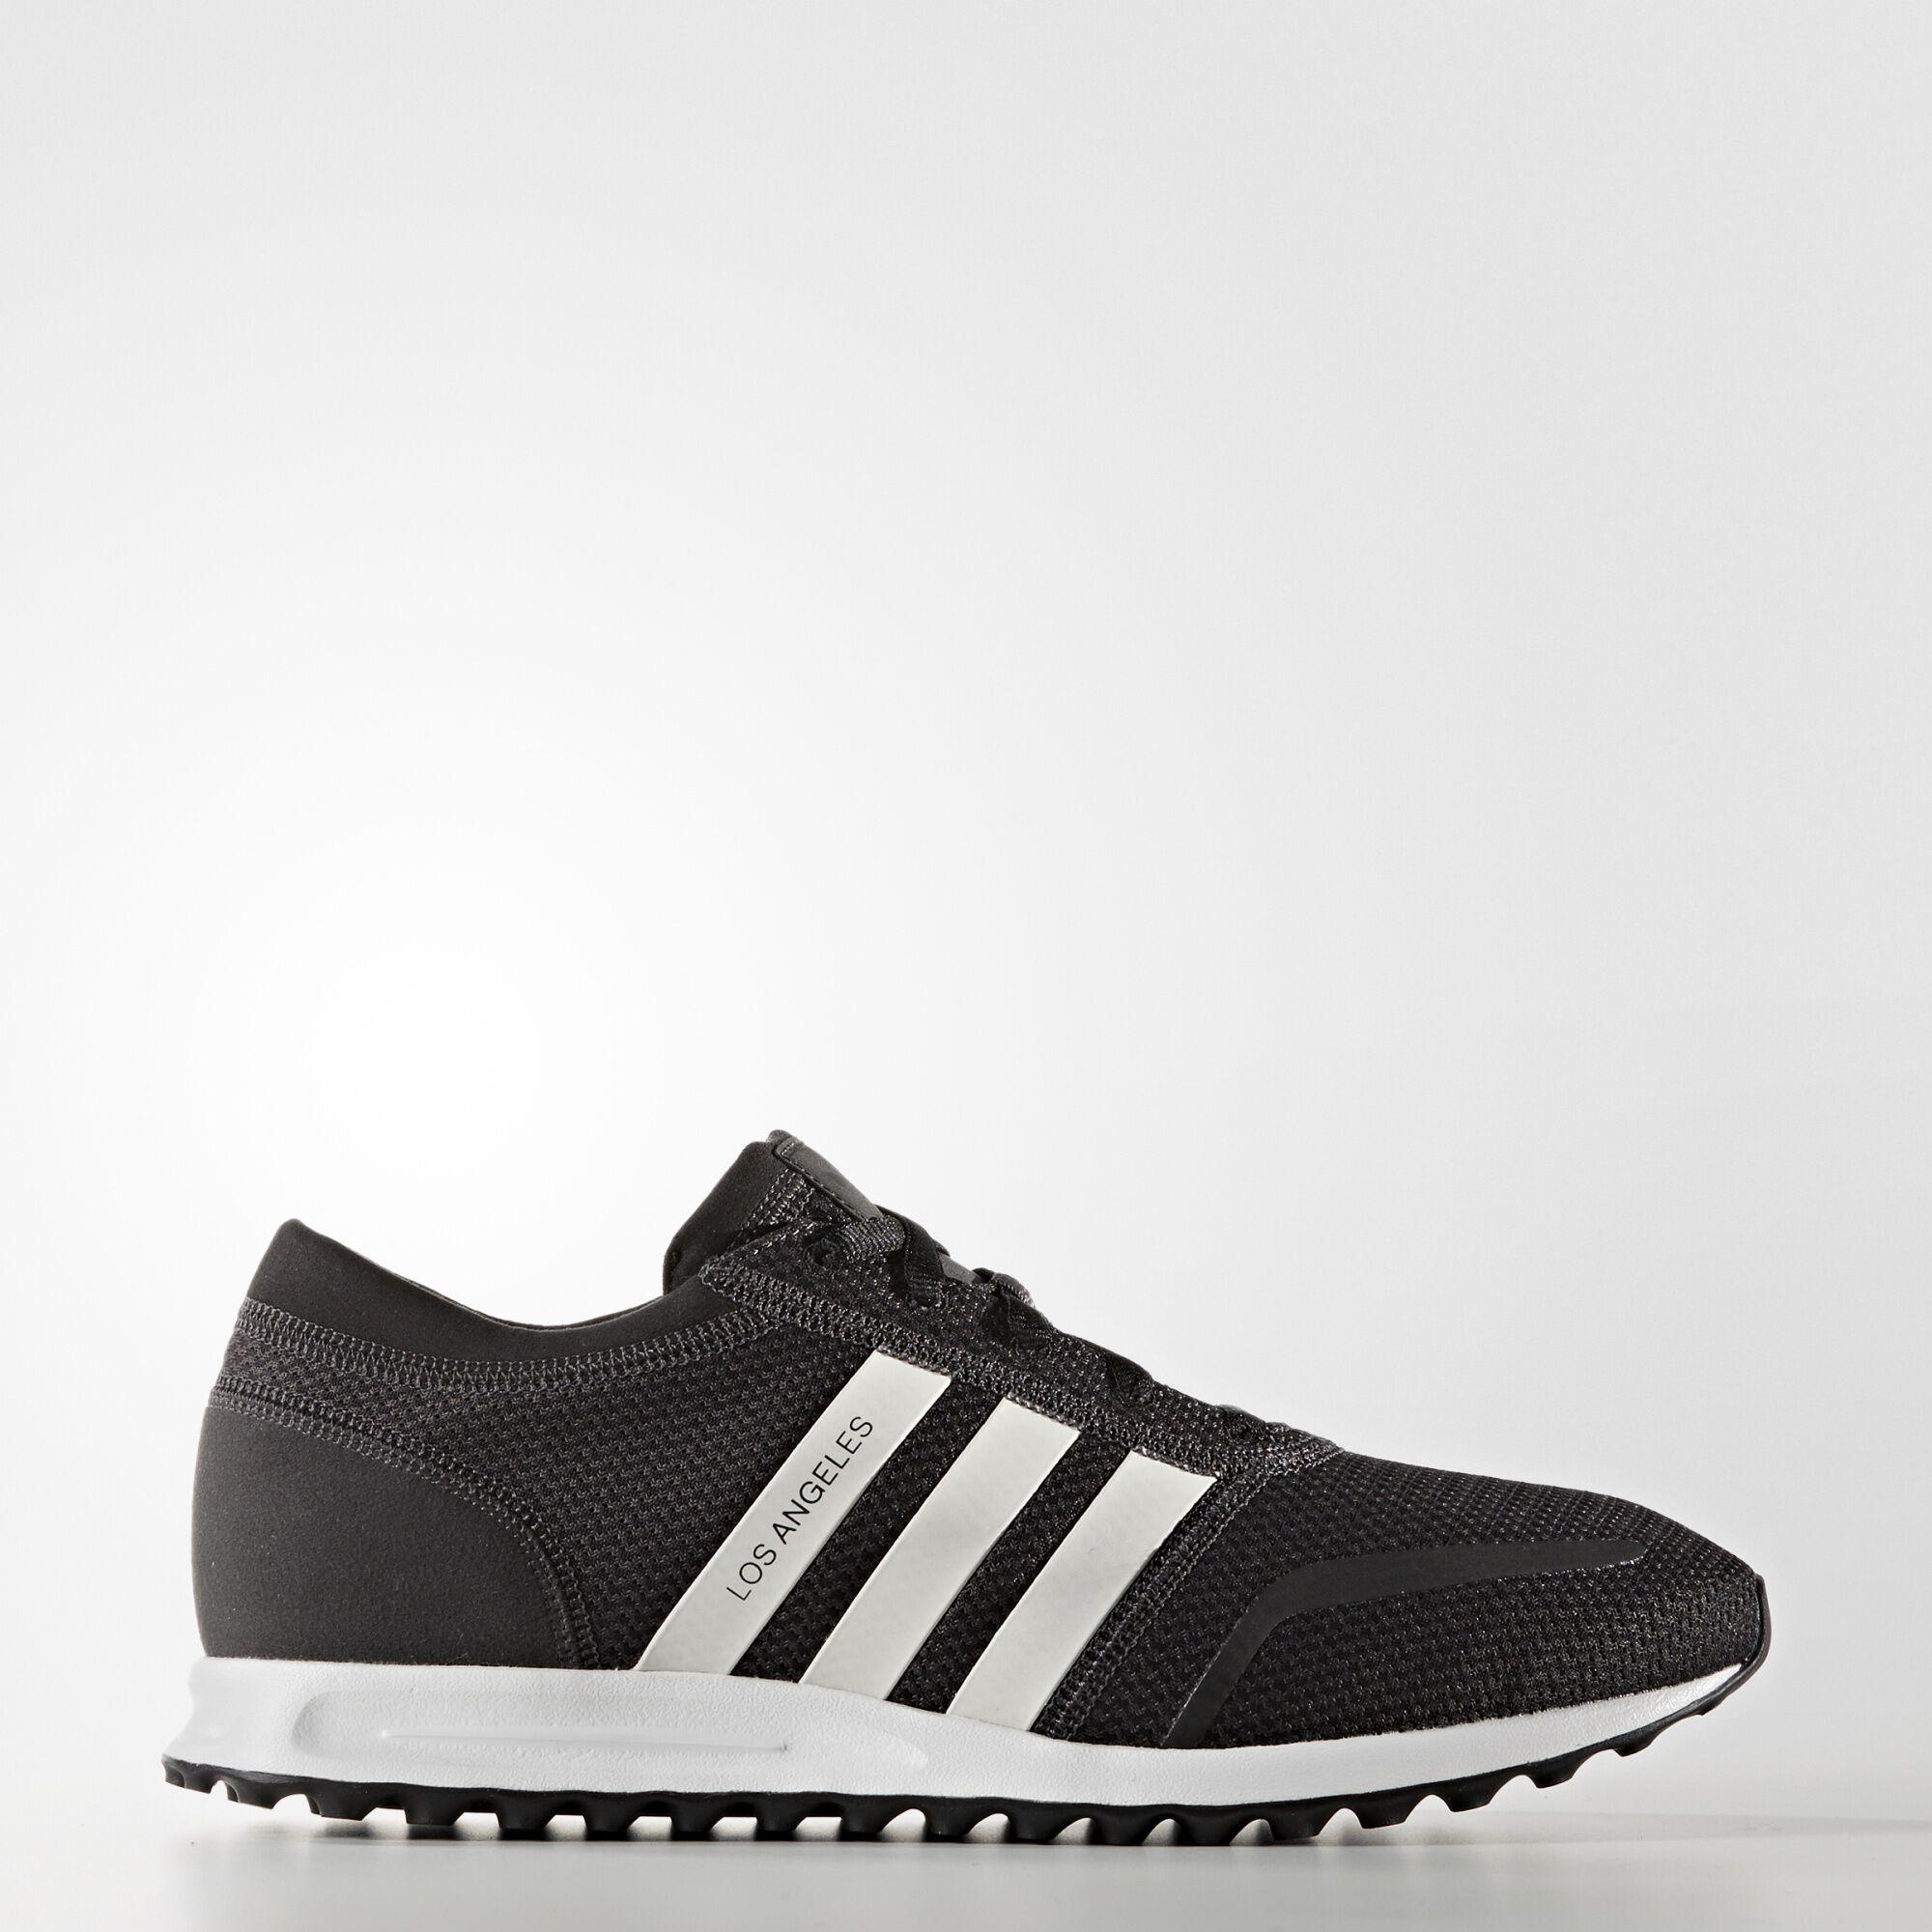 Adidas Los Angeles Black